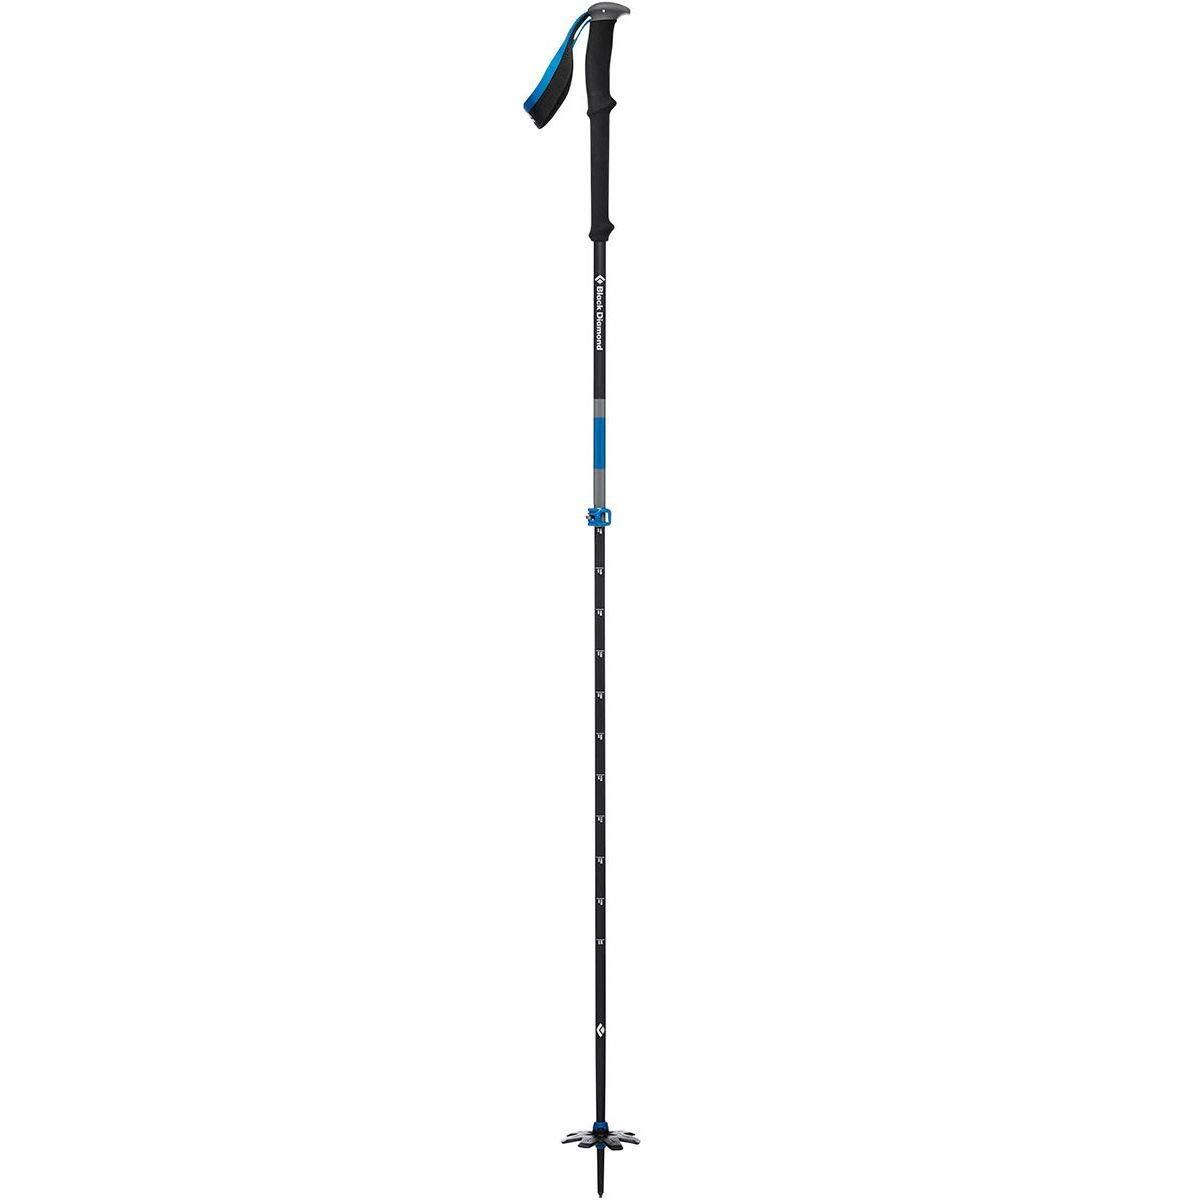 Black Diamond Expedition 2 Pro Ski Poles